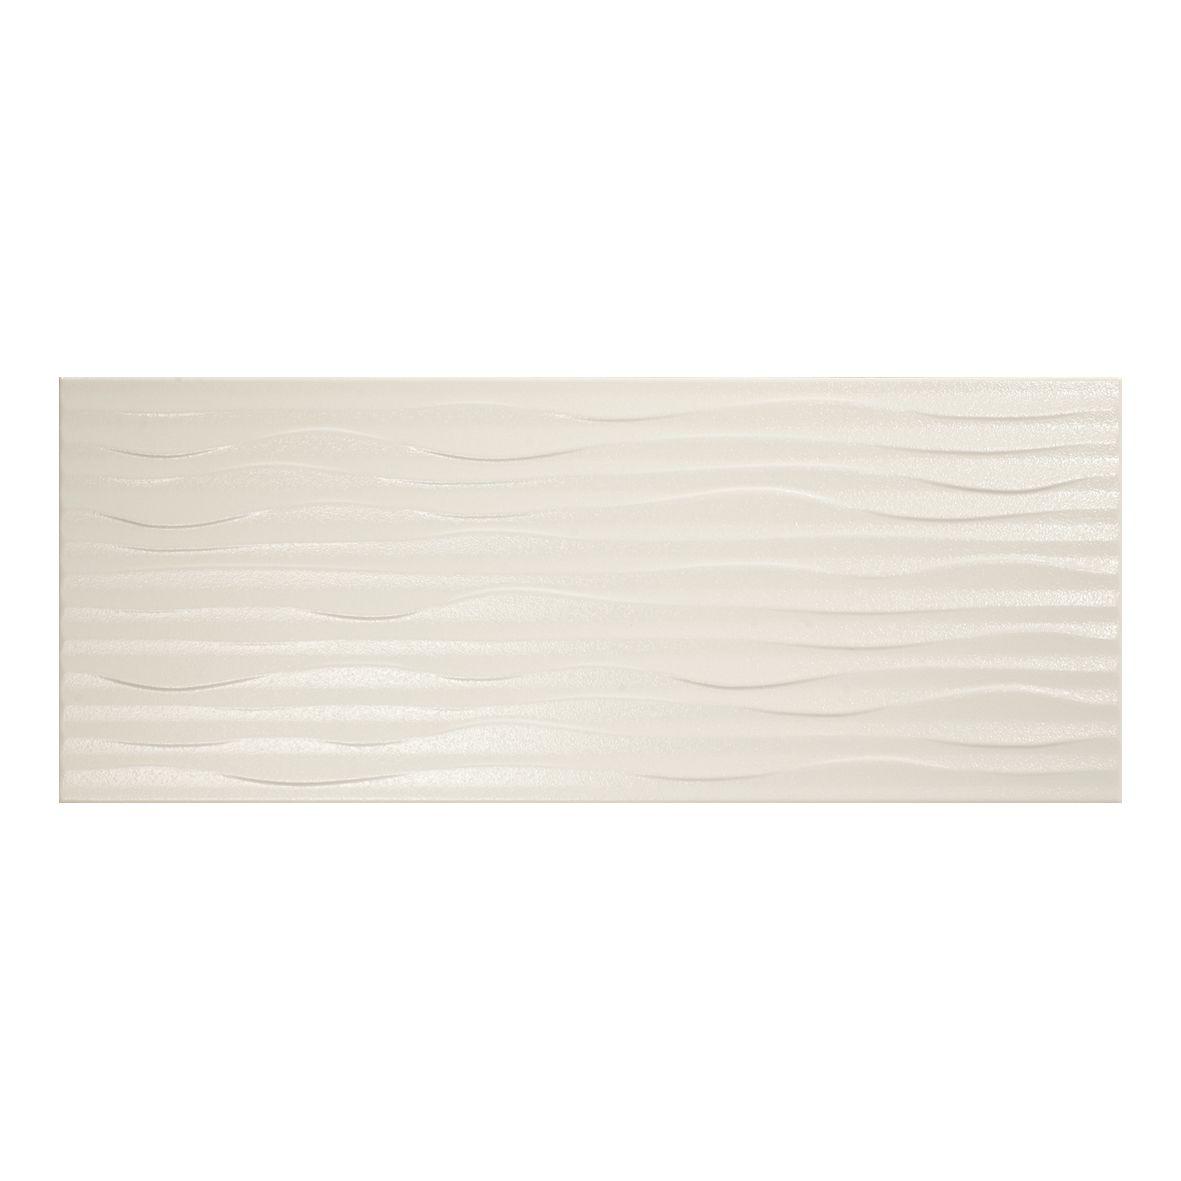 Kitchen Wall Tiles Ivory: Mapisa Armonia Ivory Ribbed Bathroom & Kitchen Wall Tiles